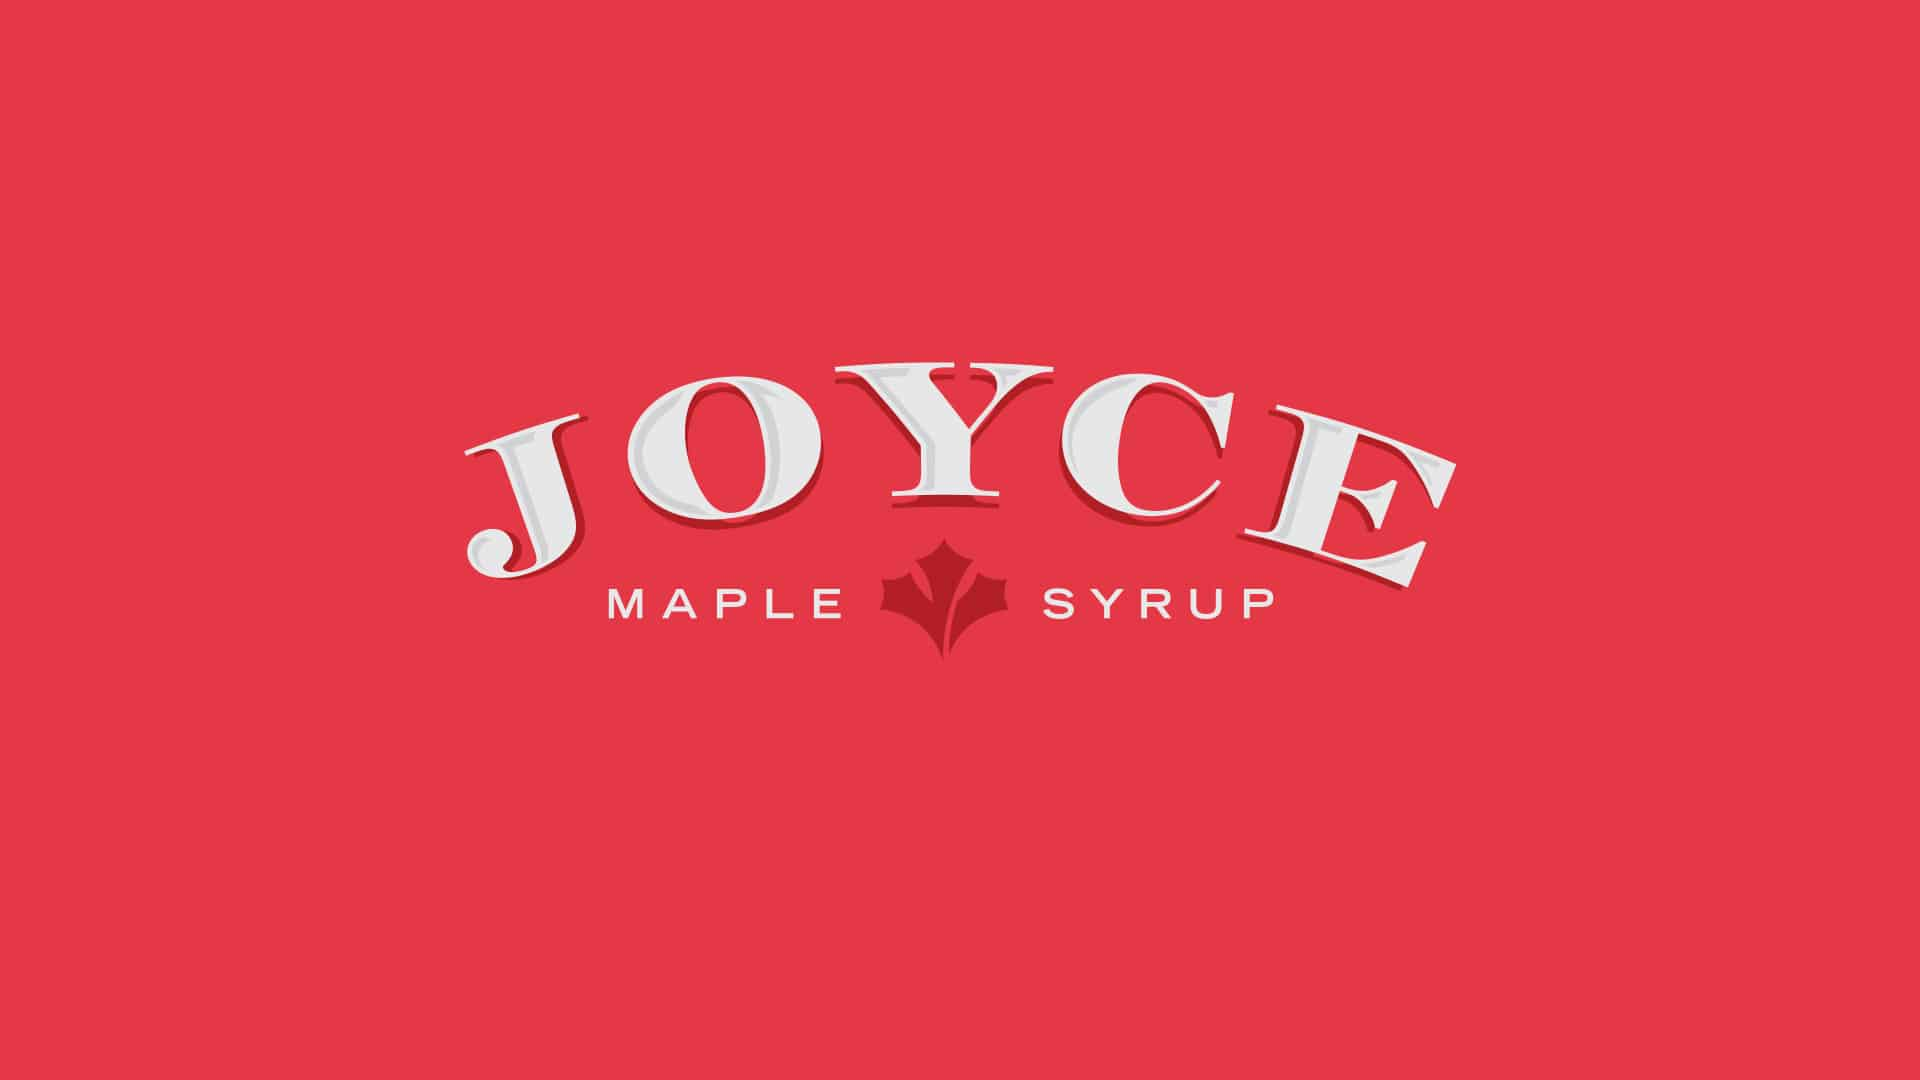 joyce maple syrup branding logo